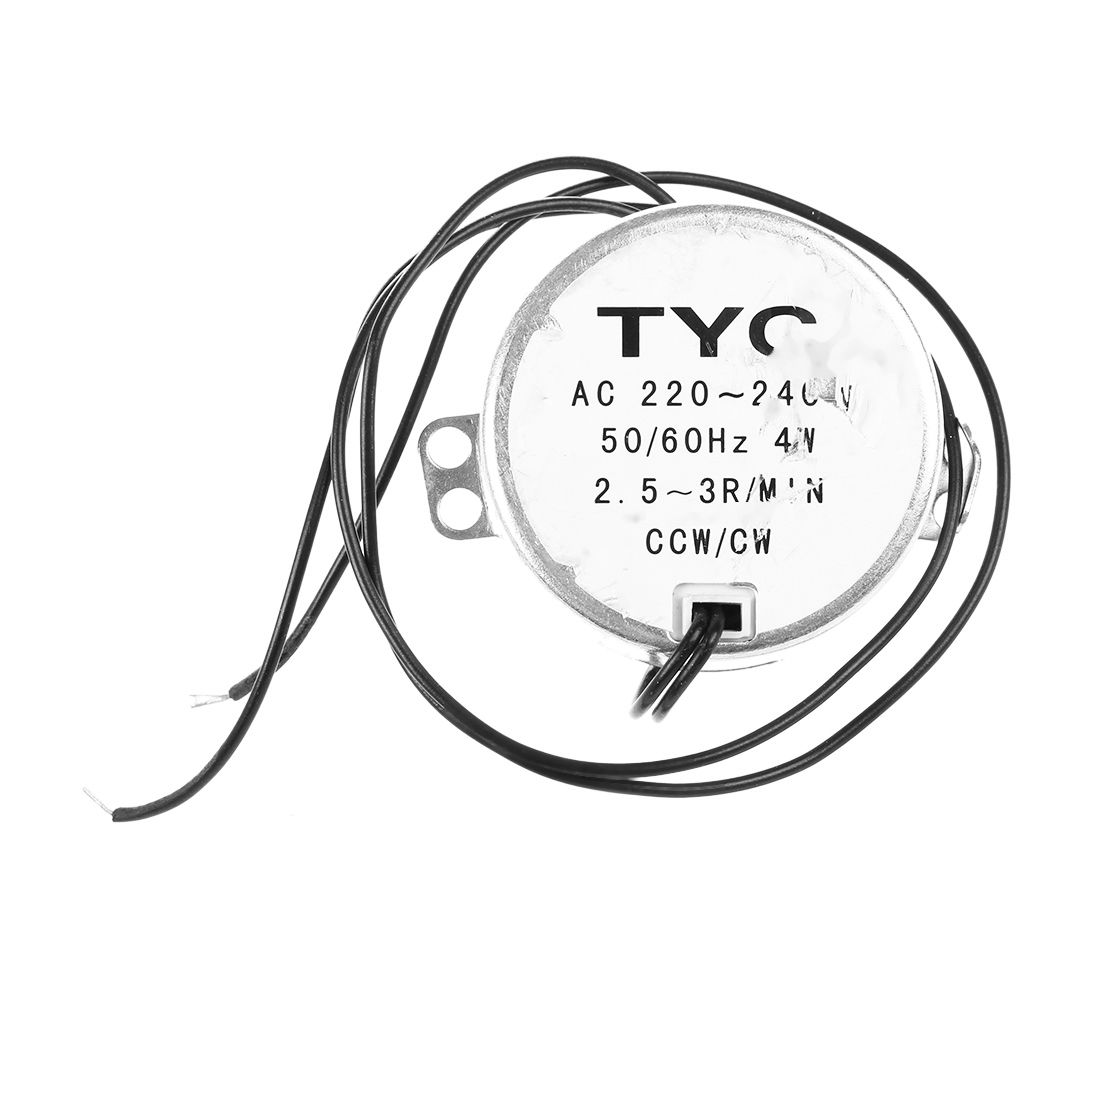 Tyc50 Ac Synchronous Motor 220v 3rpm 4w 8kgf Torque Ccw